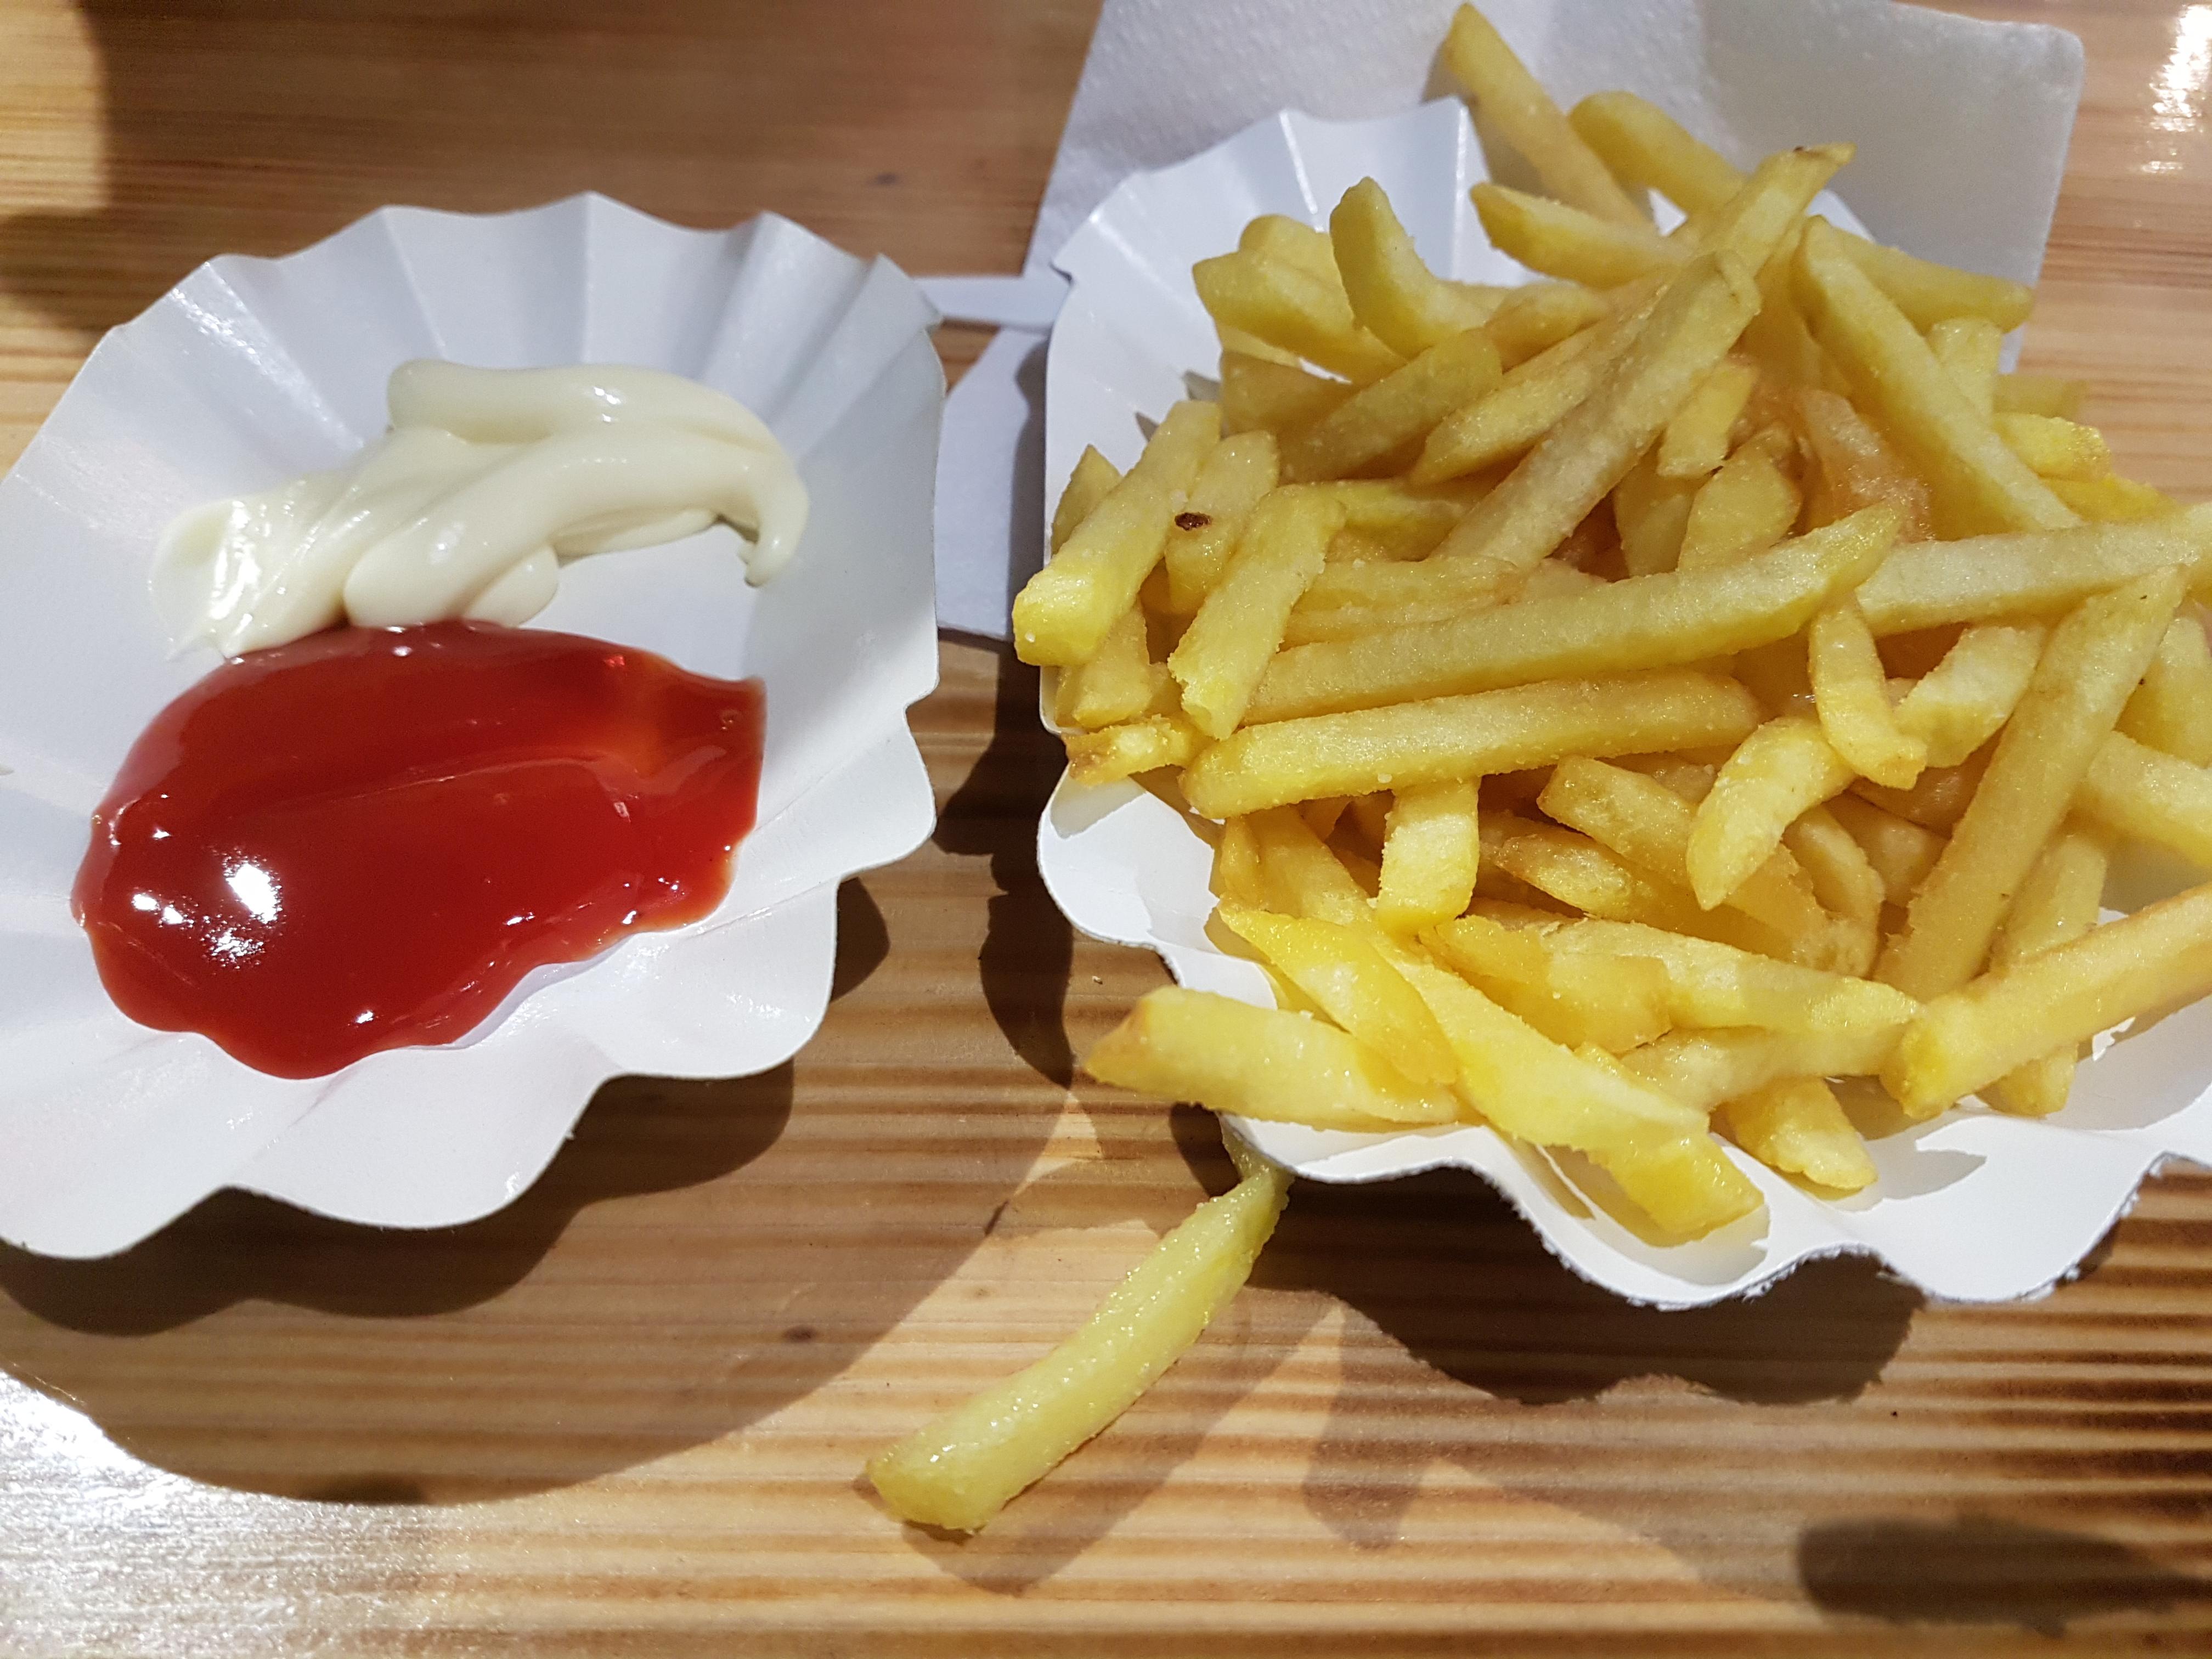 http://foodloader.net/Holz_2018-08-19_Pommes.jpg